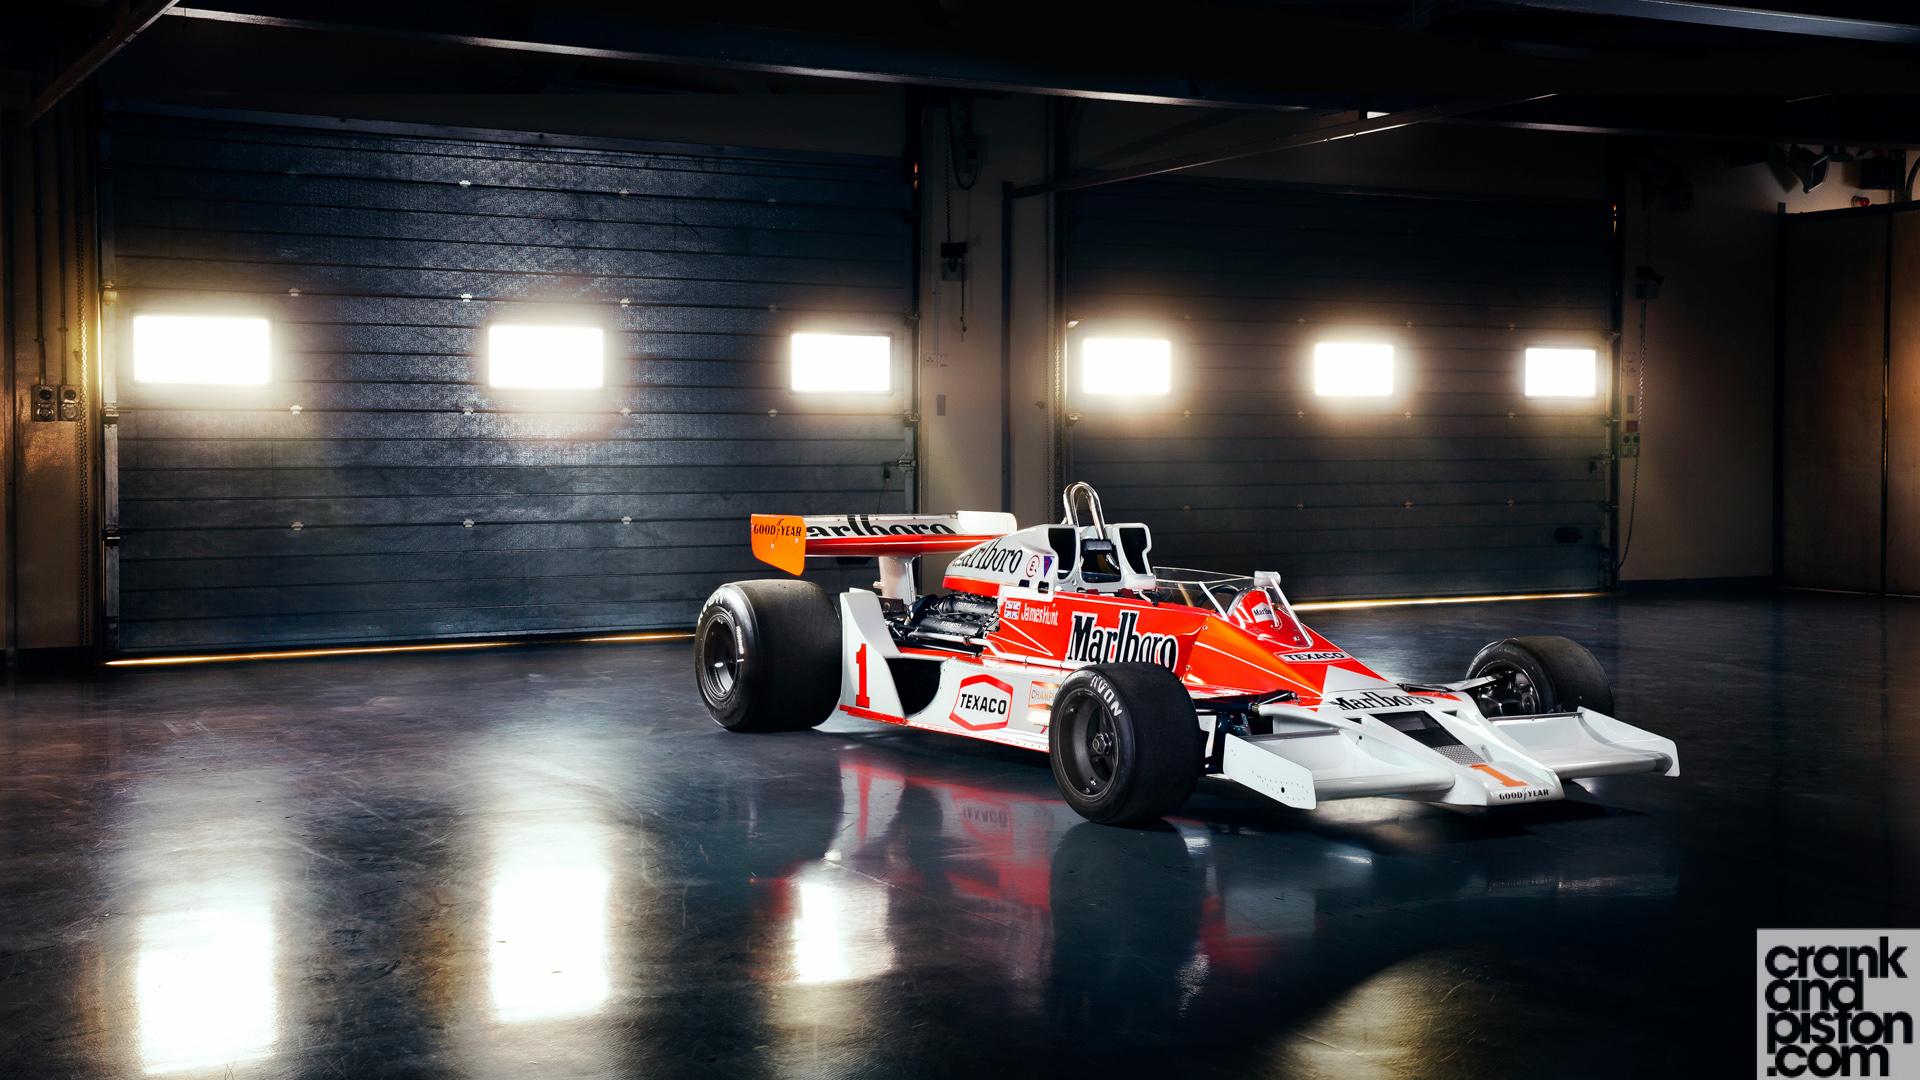 Mclaren F1 Iphone Wallpaper Mclaren M26 James Hunt Dubai Autodrome Wallpaper Hd Car